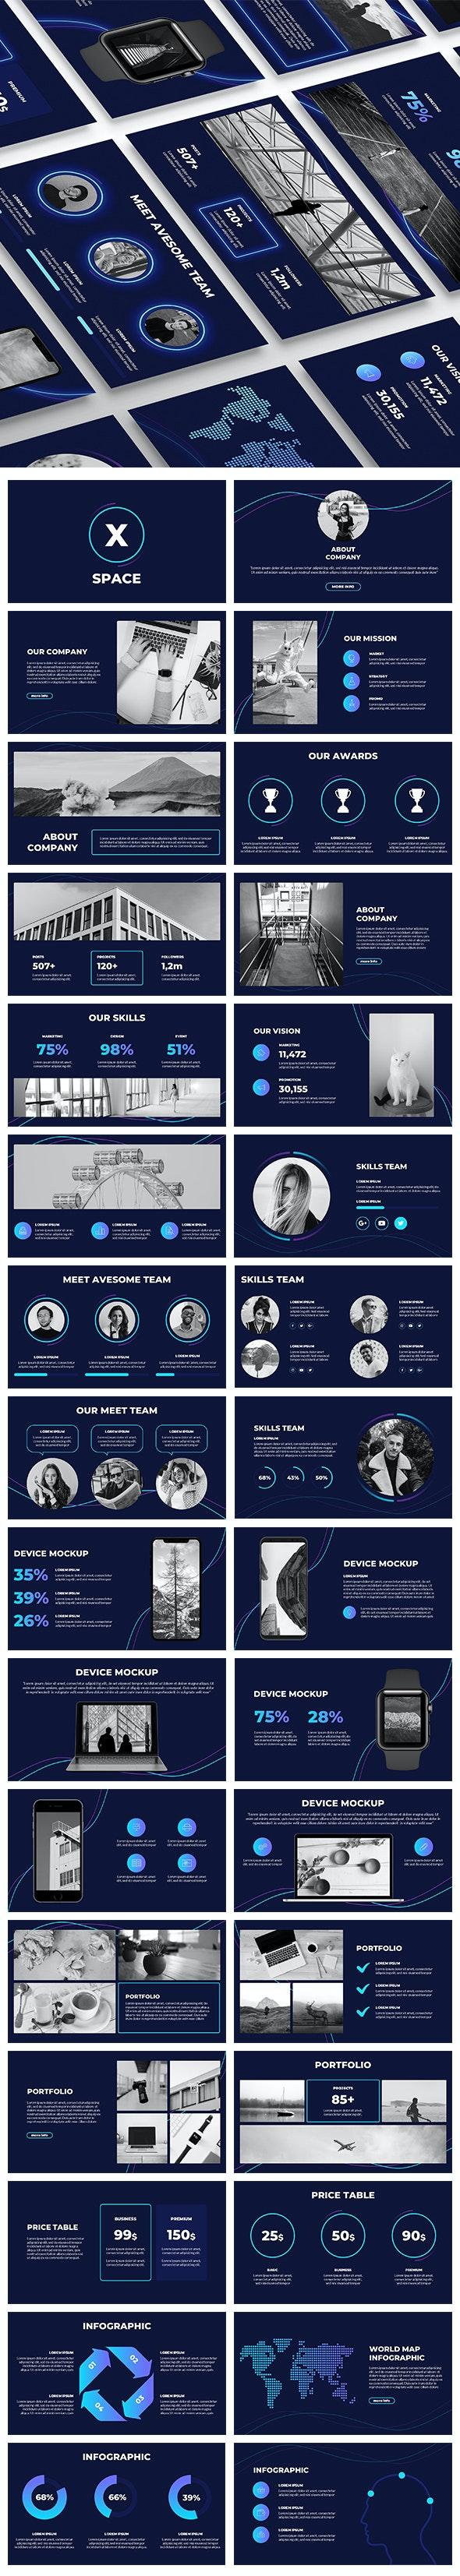 SpaceX Keynote Template - Business Keynote Templates